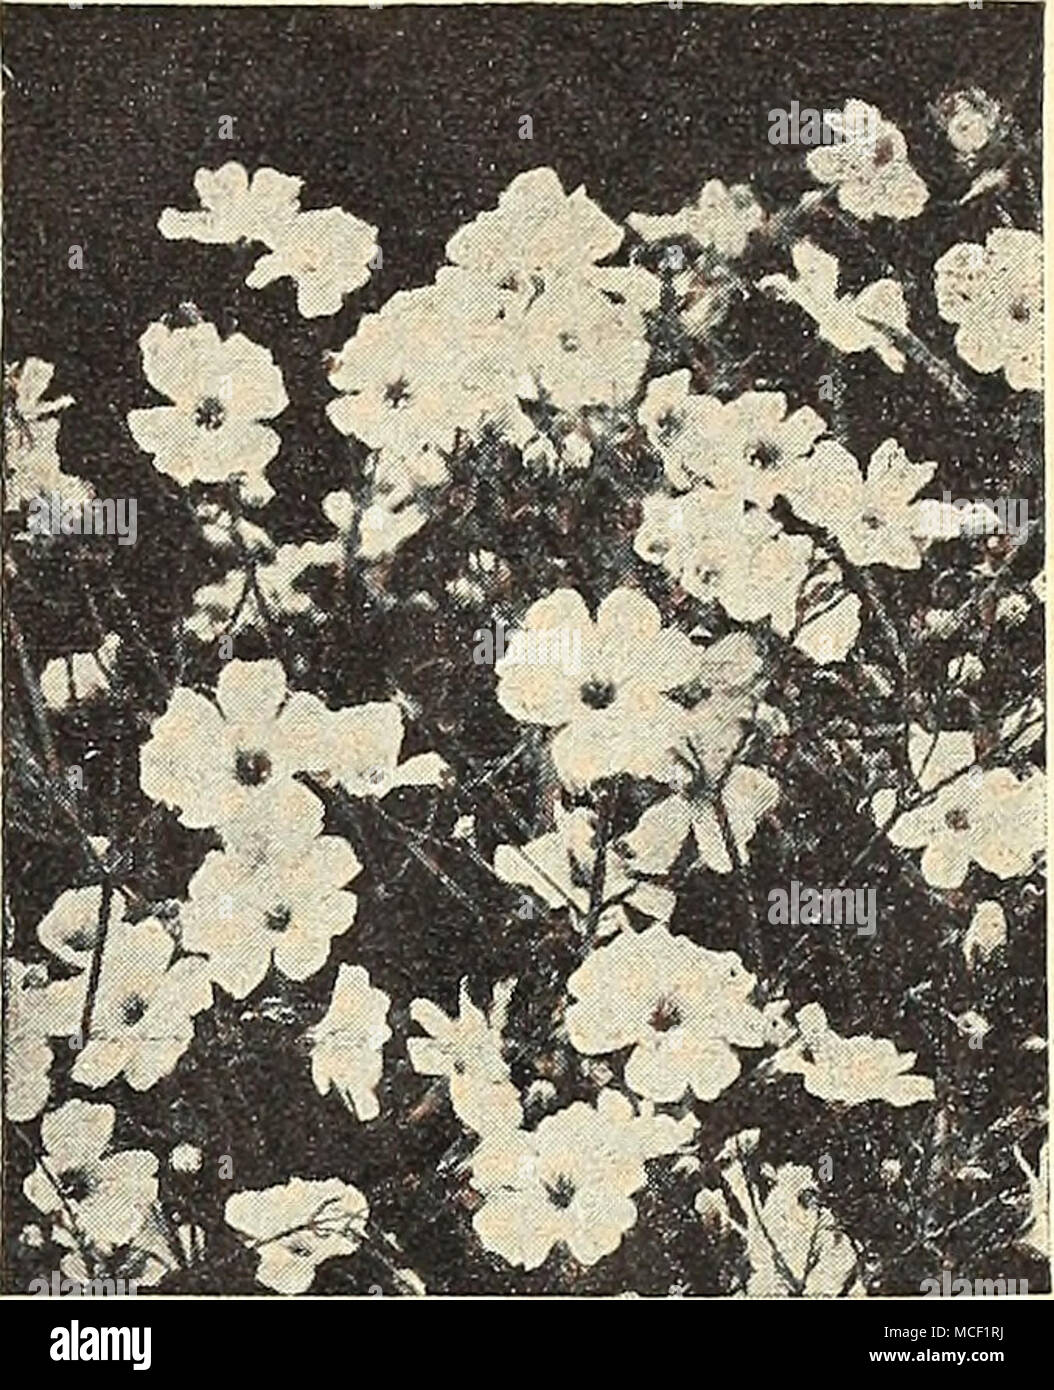 Annual Gypsophila Gypsophila Babys Breath Annual Varieties Dainty